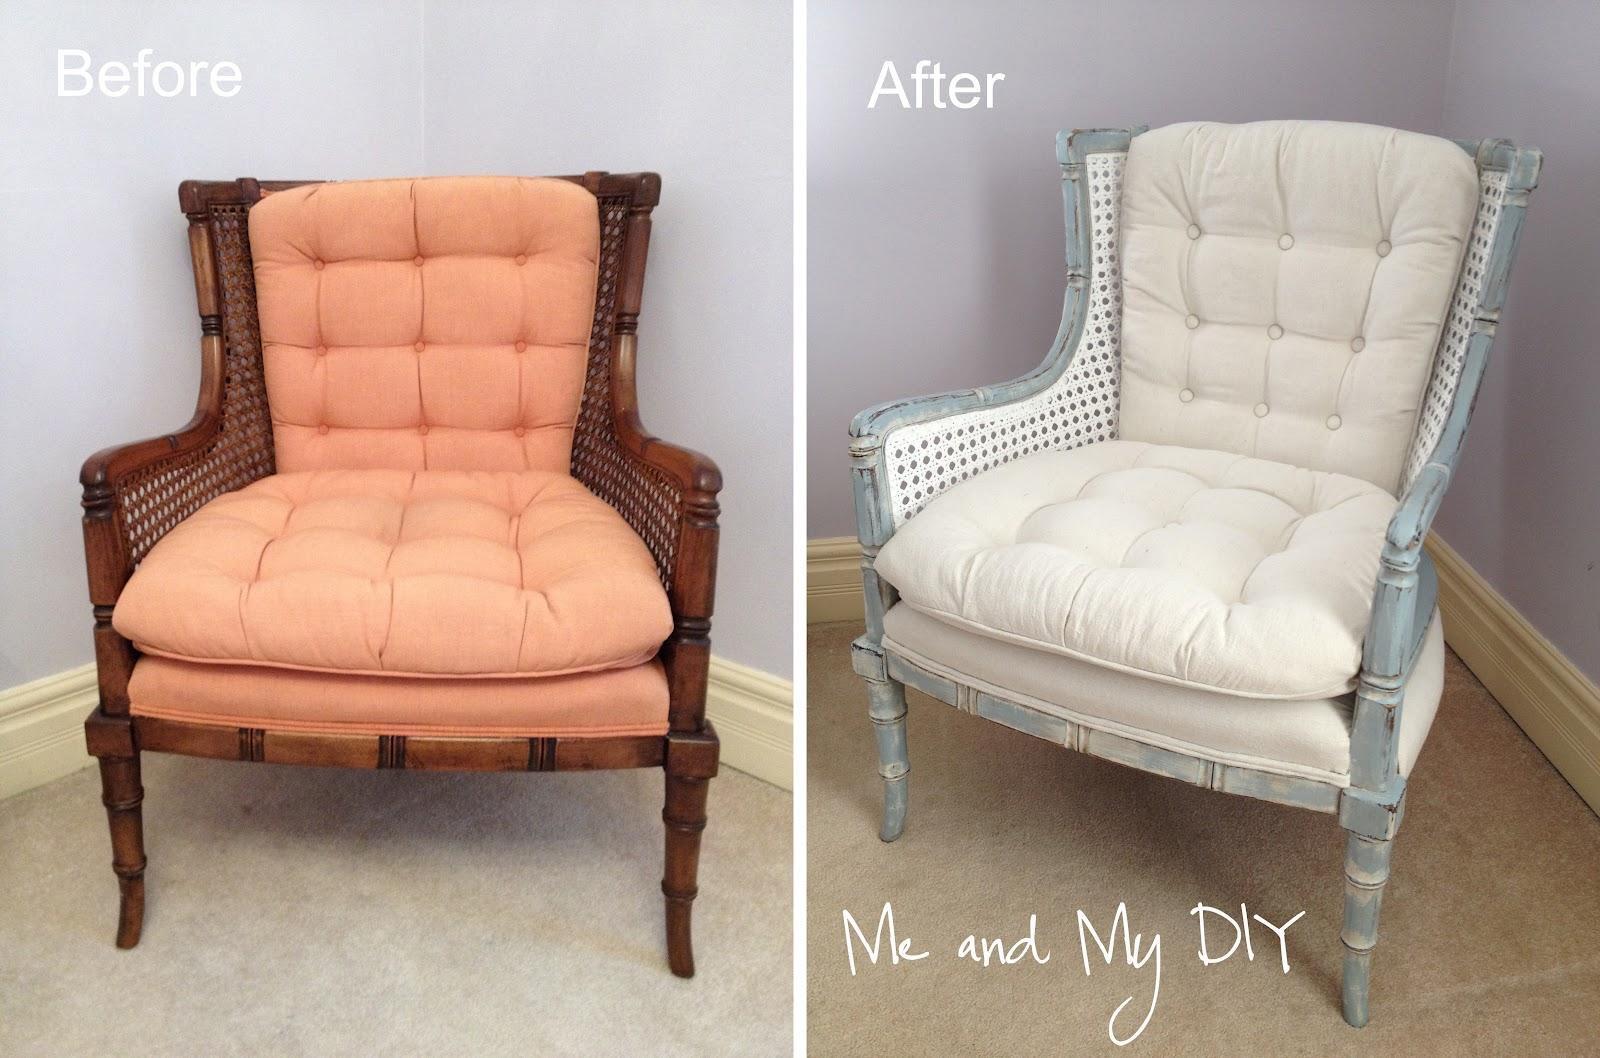 Cane chairs with cushions - Cane Chairs With Cushions 33